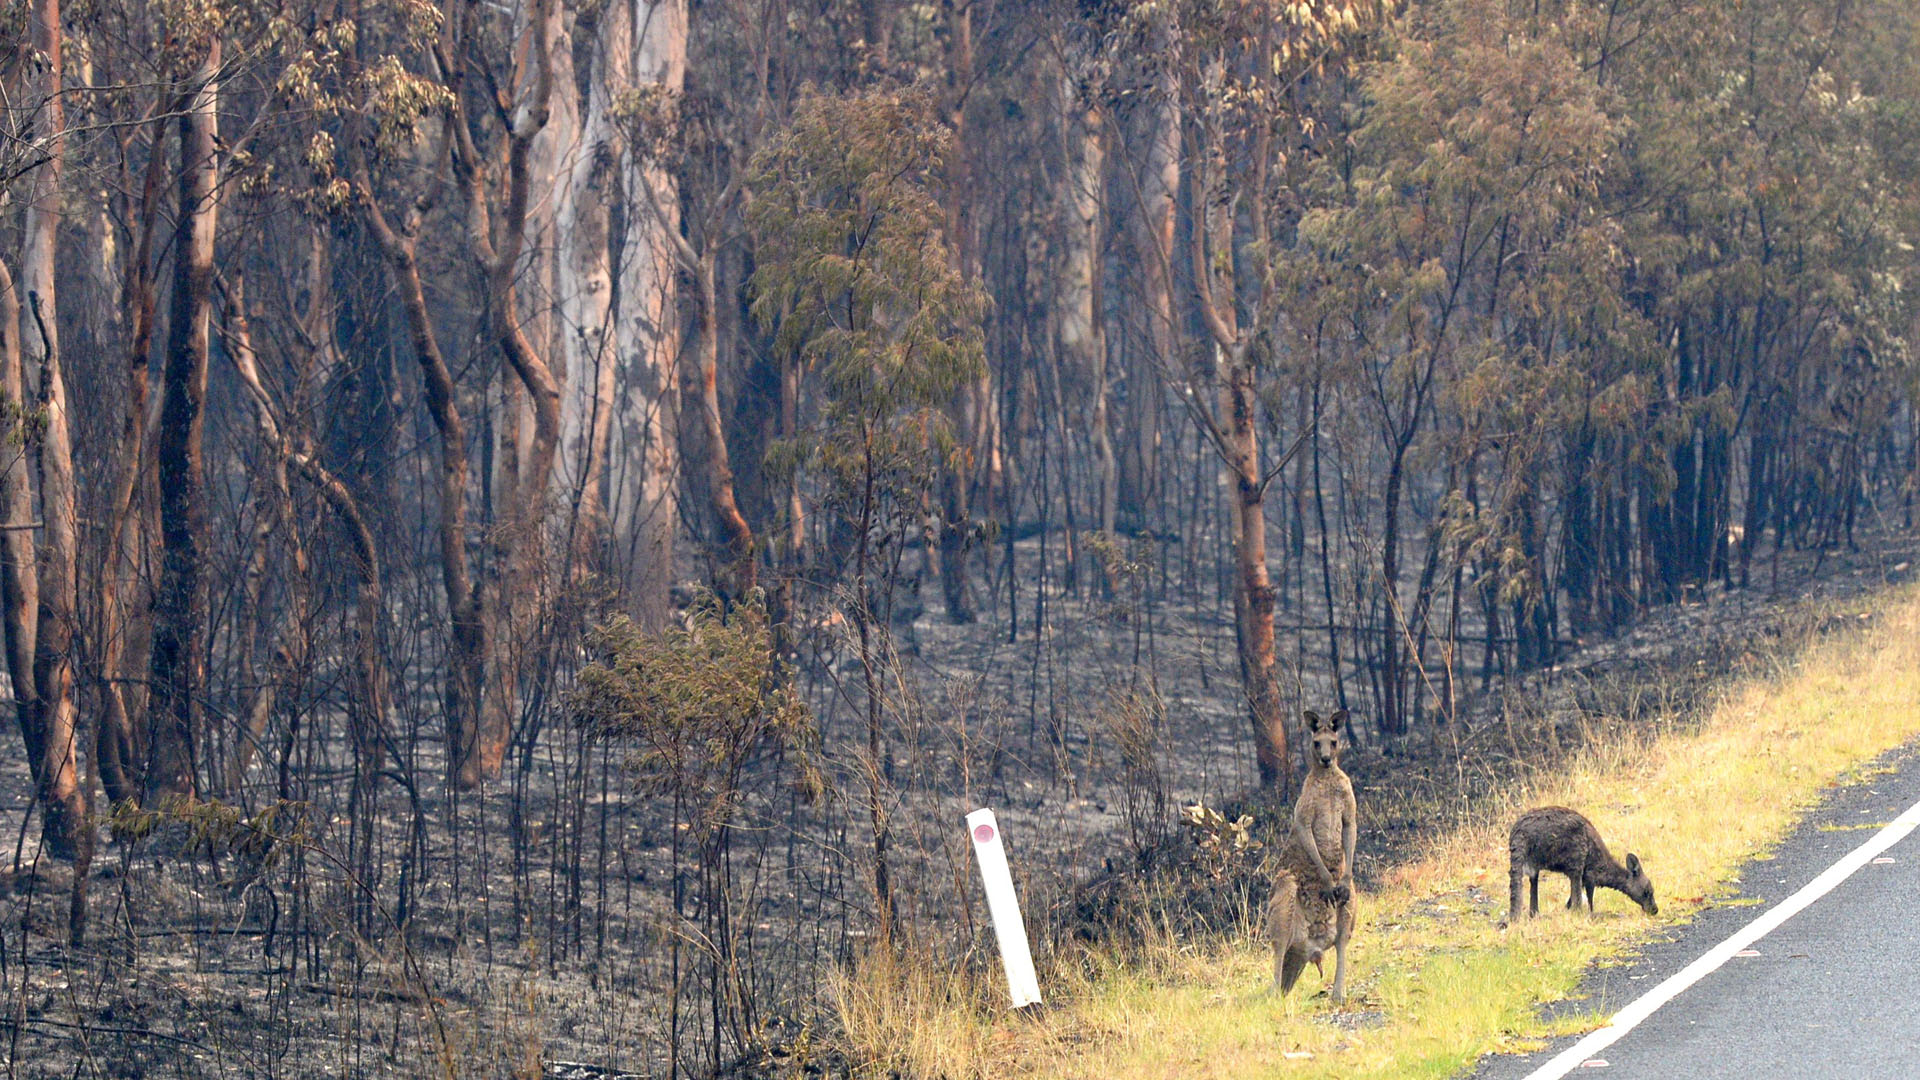 Vida silvestre que sobrevivió a incendios forestales, en el Parque Nacional Wollemi, Australia. Foto de EFE